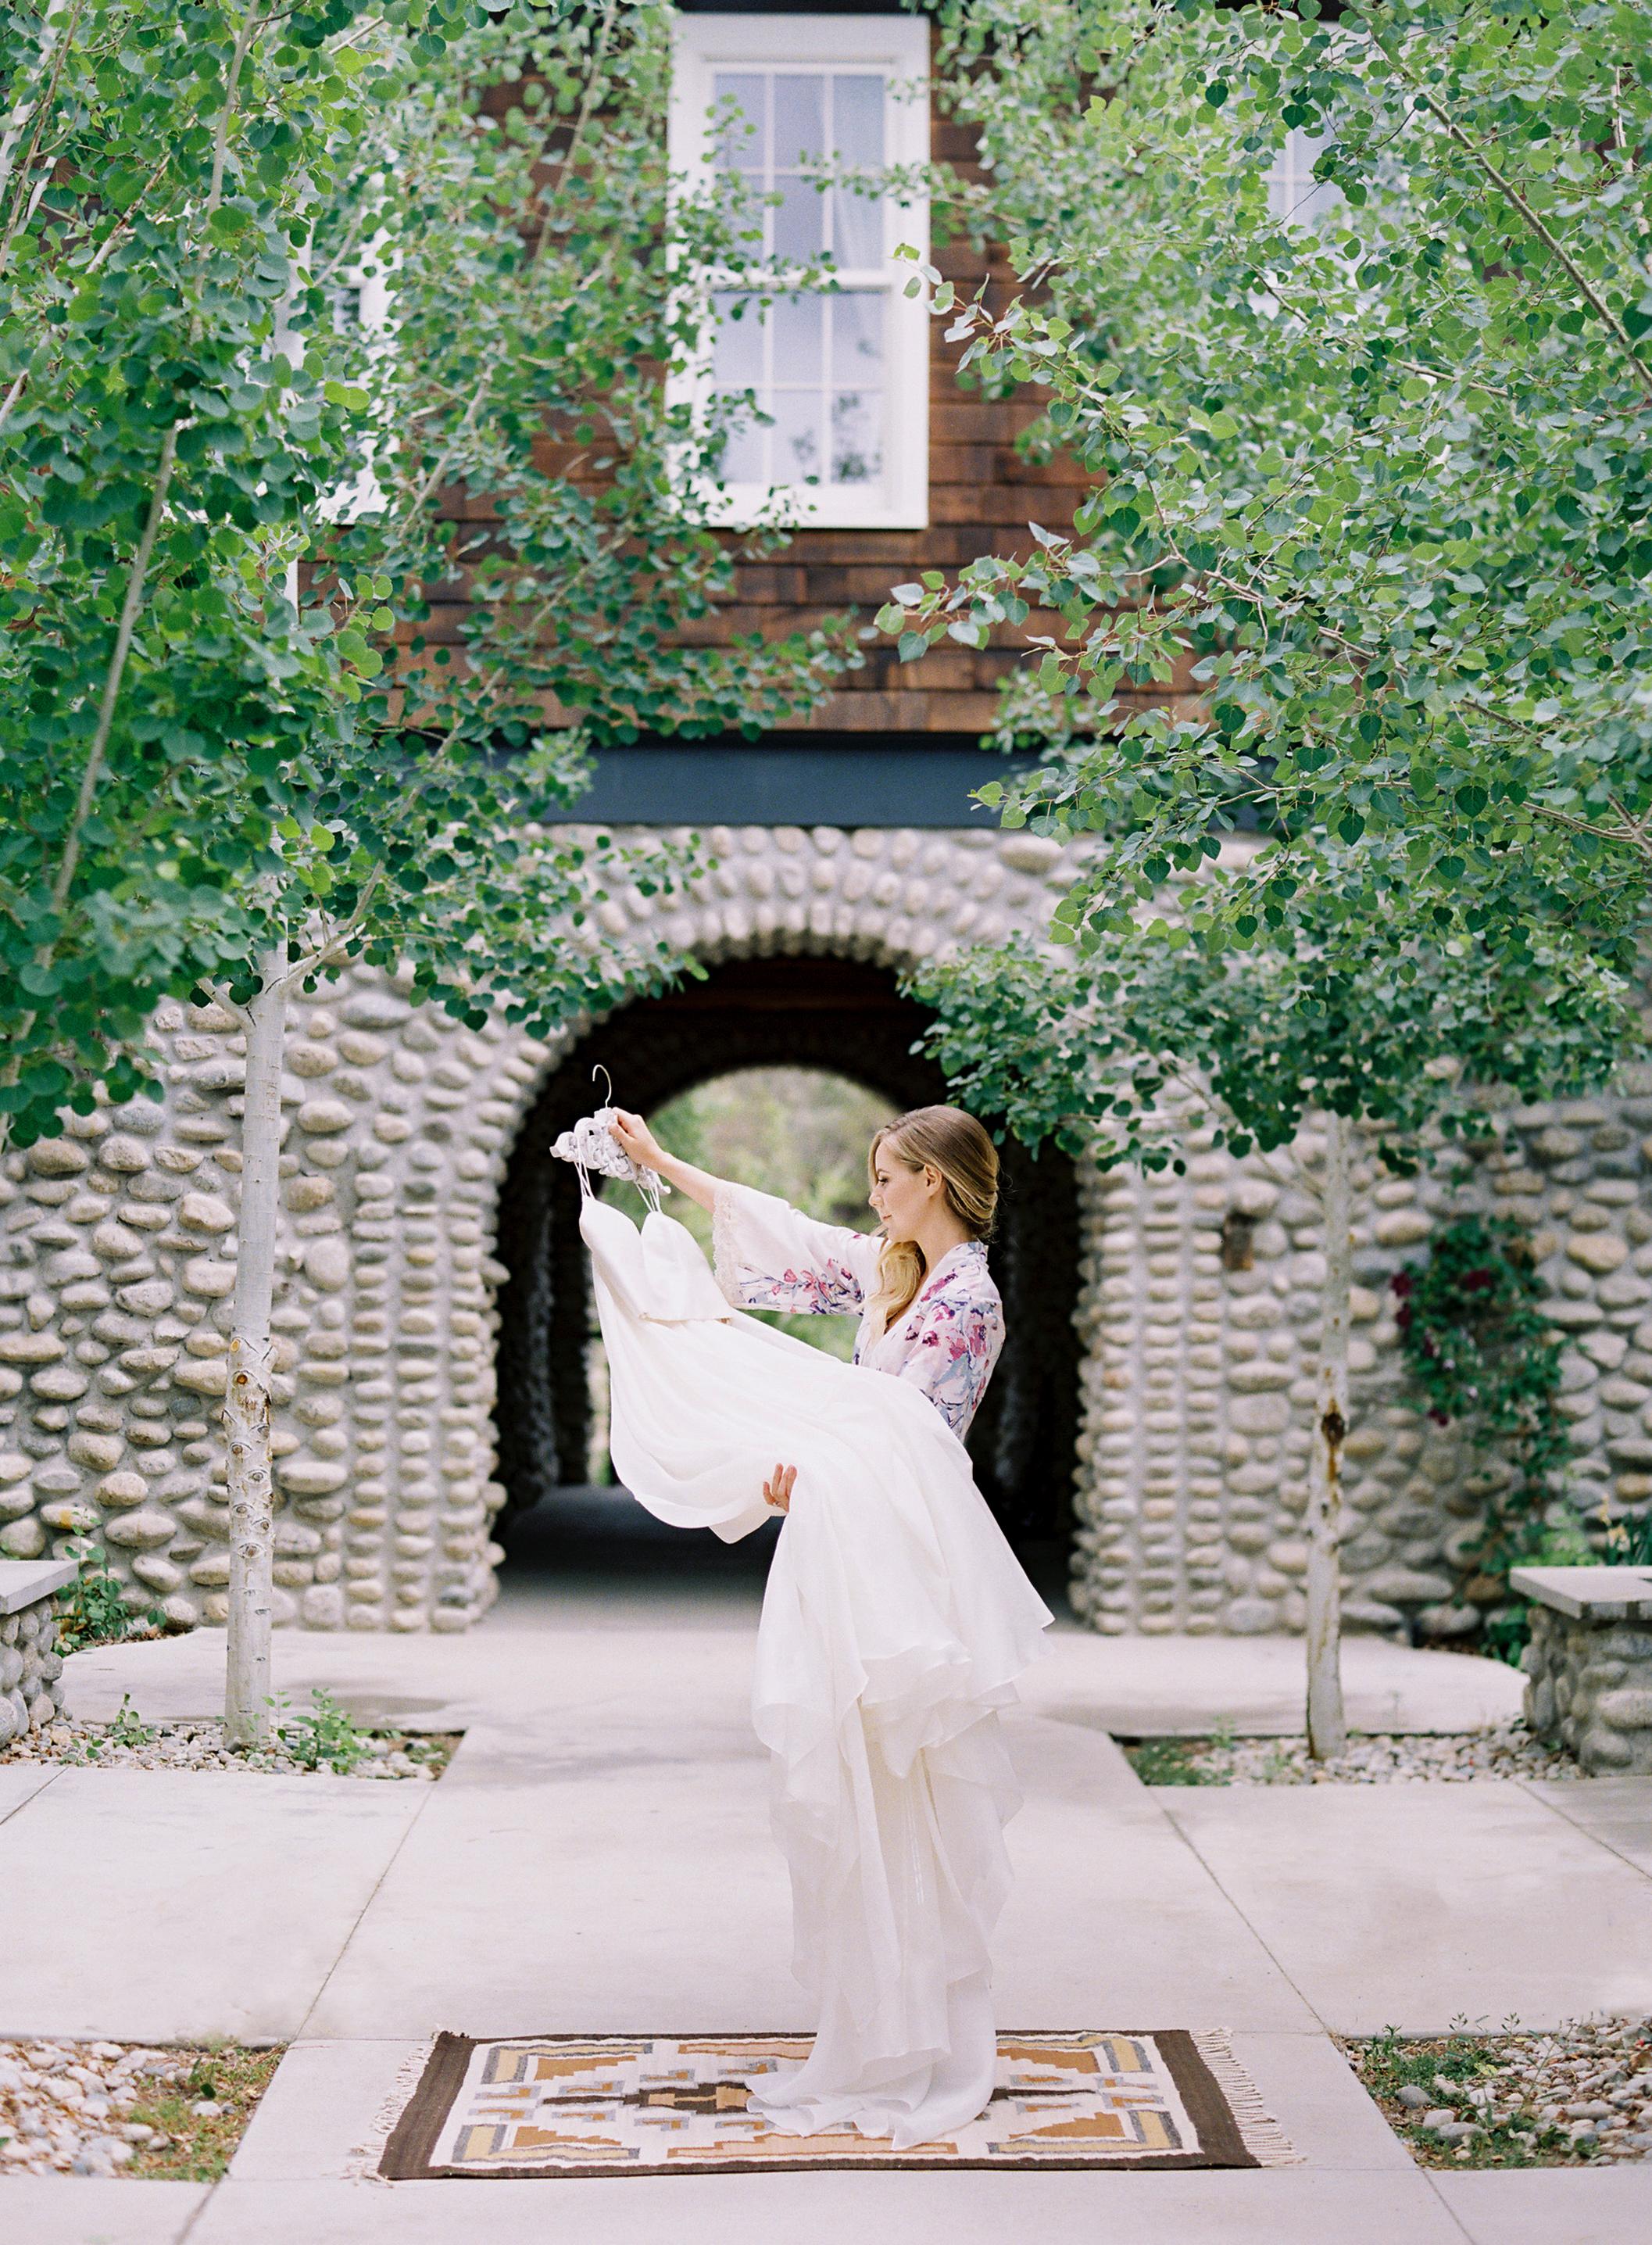 Jessica and Thomas-Wedding-Carrie King Photographer-2.jpg